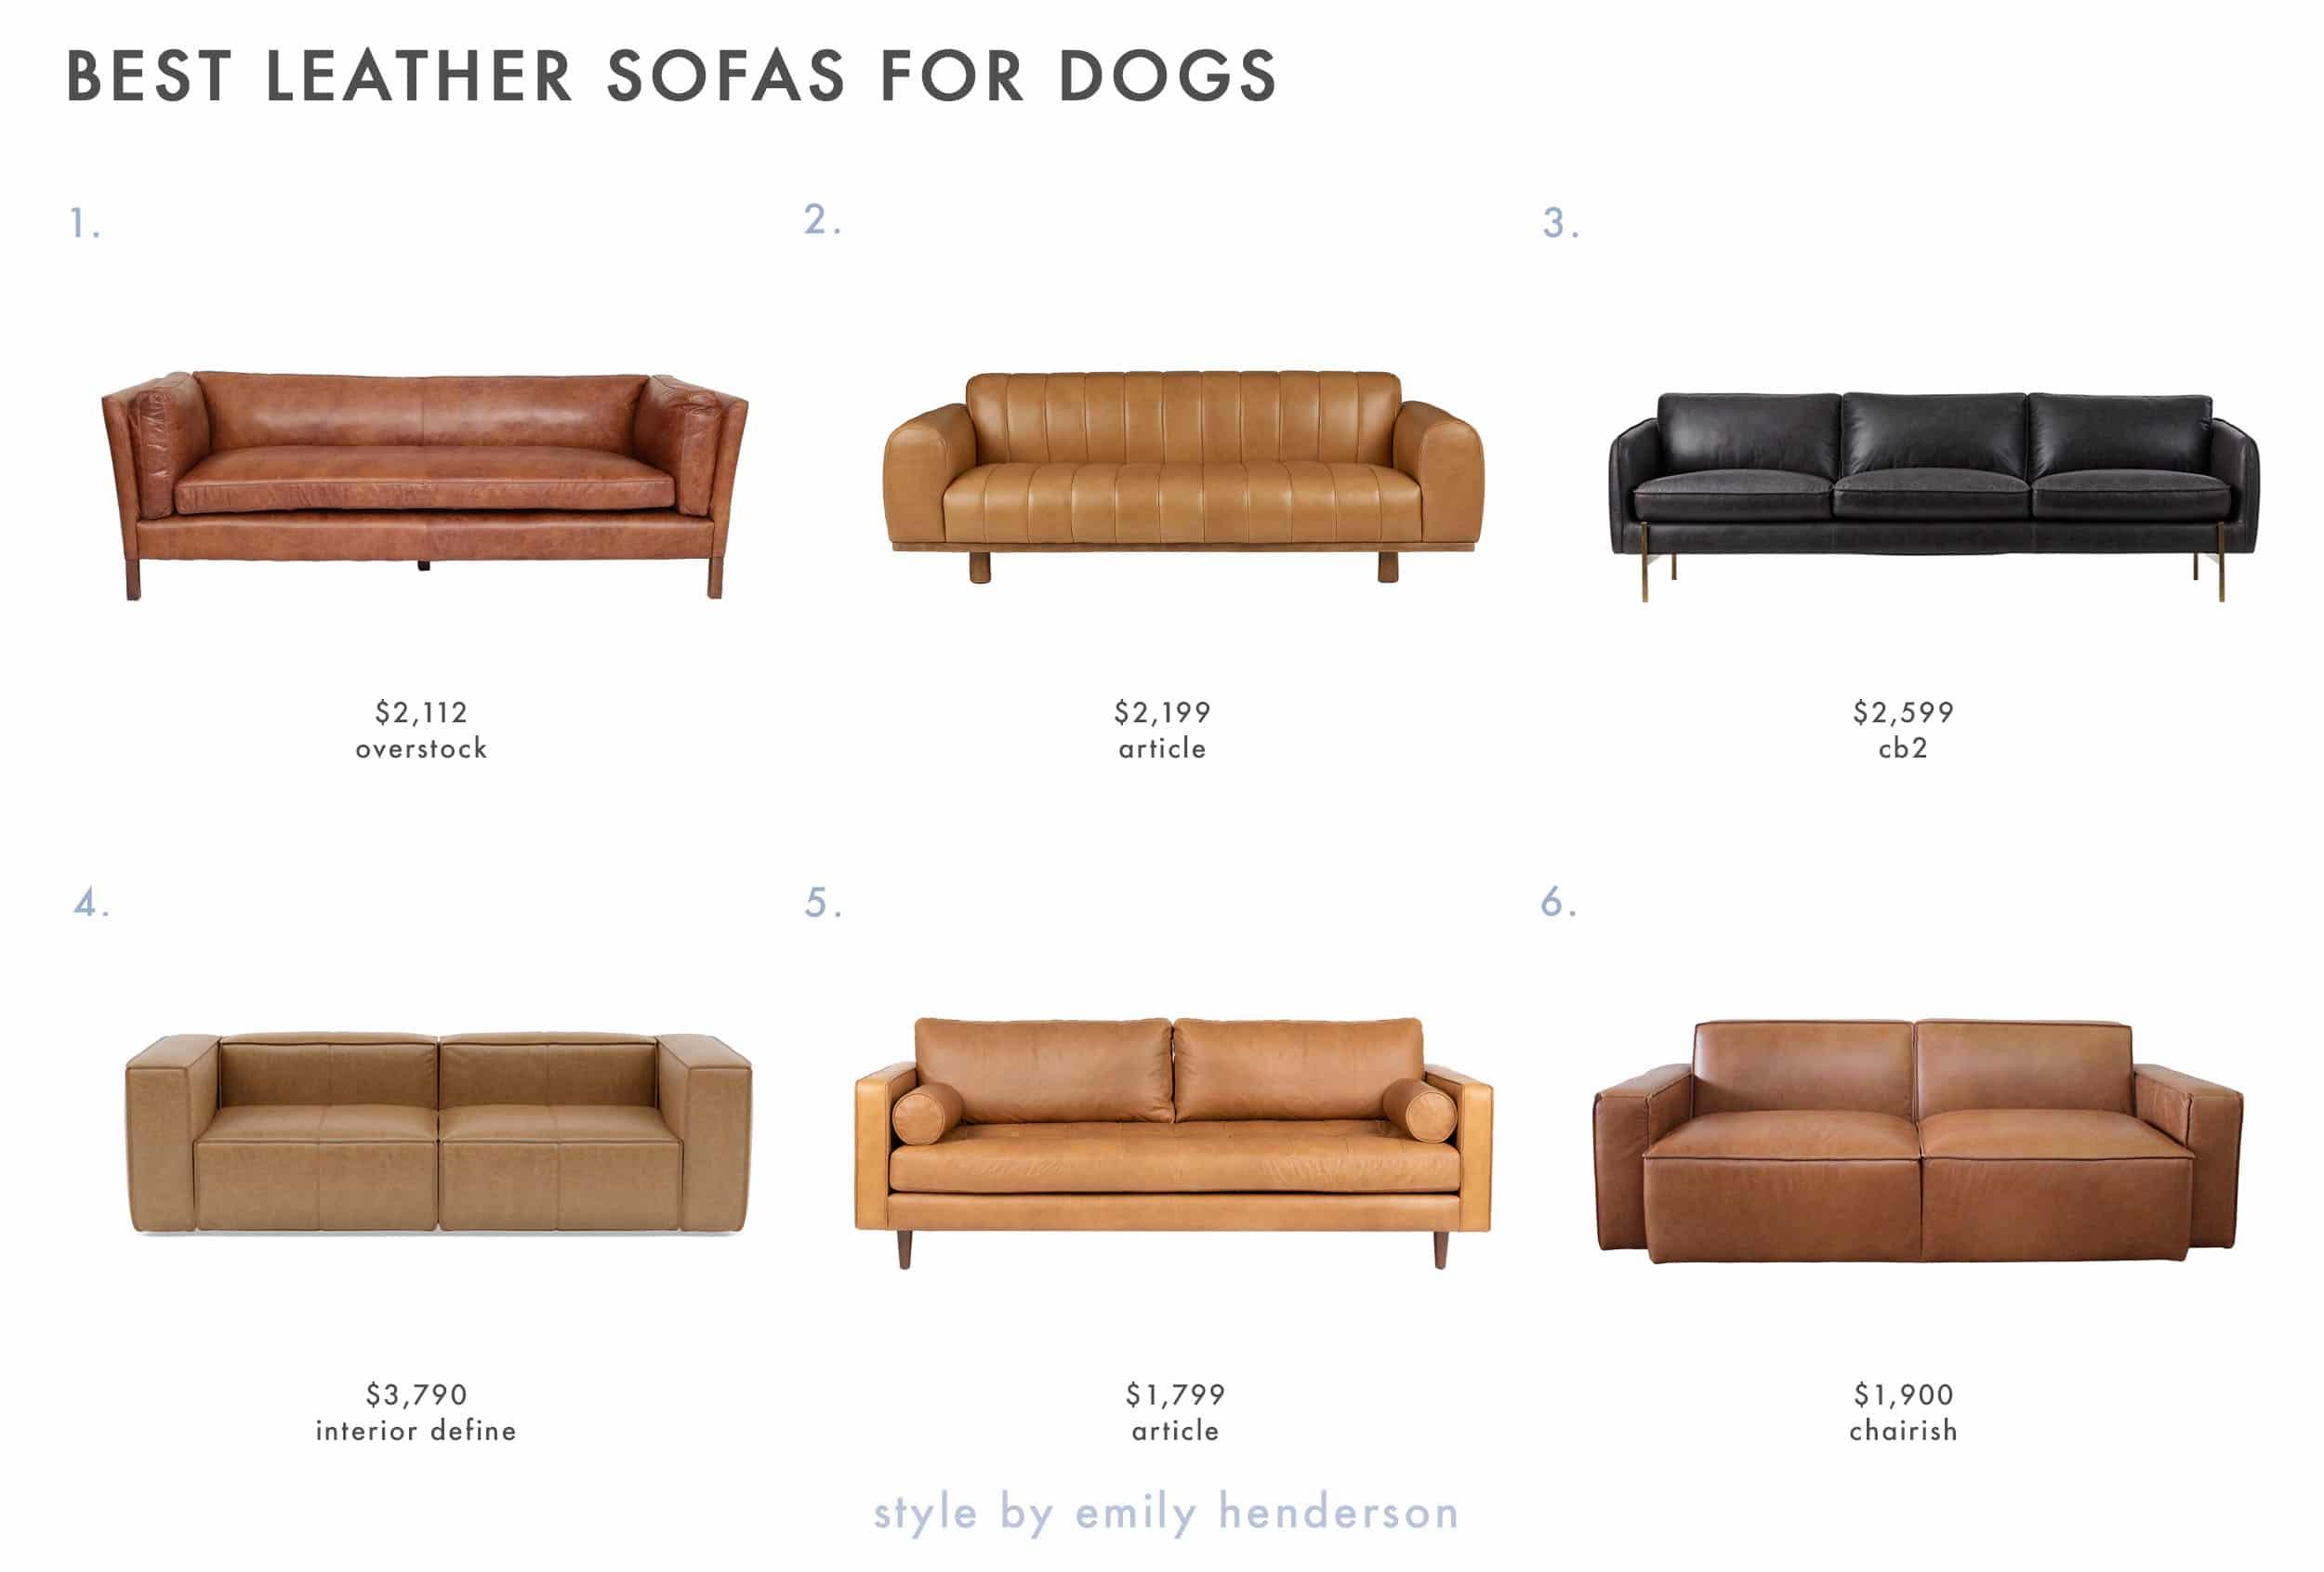 Dog Friendly Sofas 1